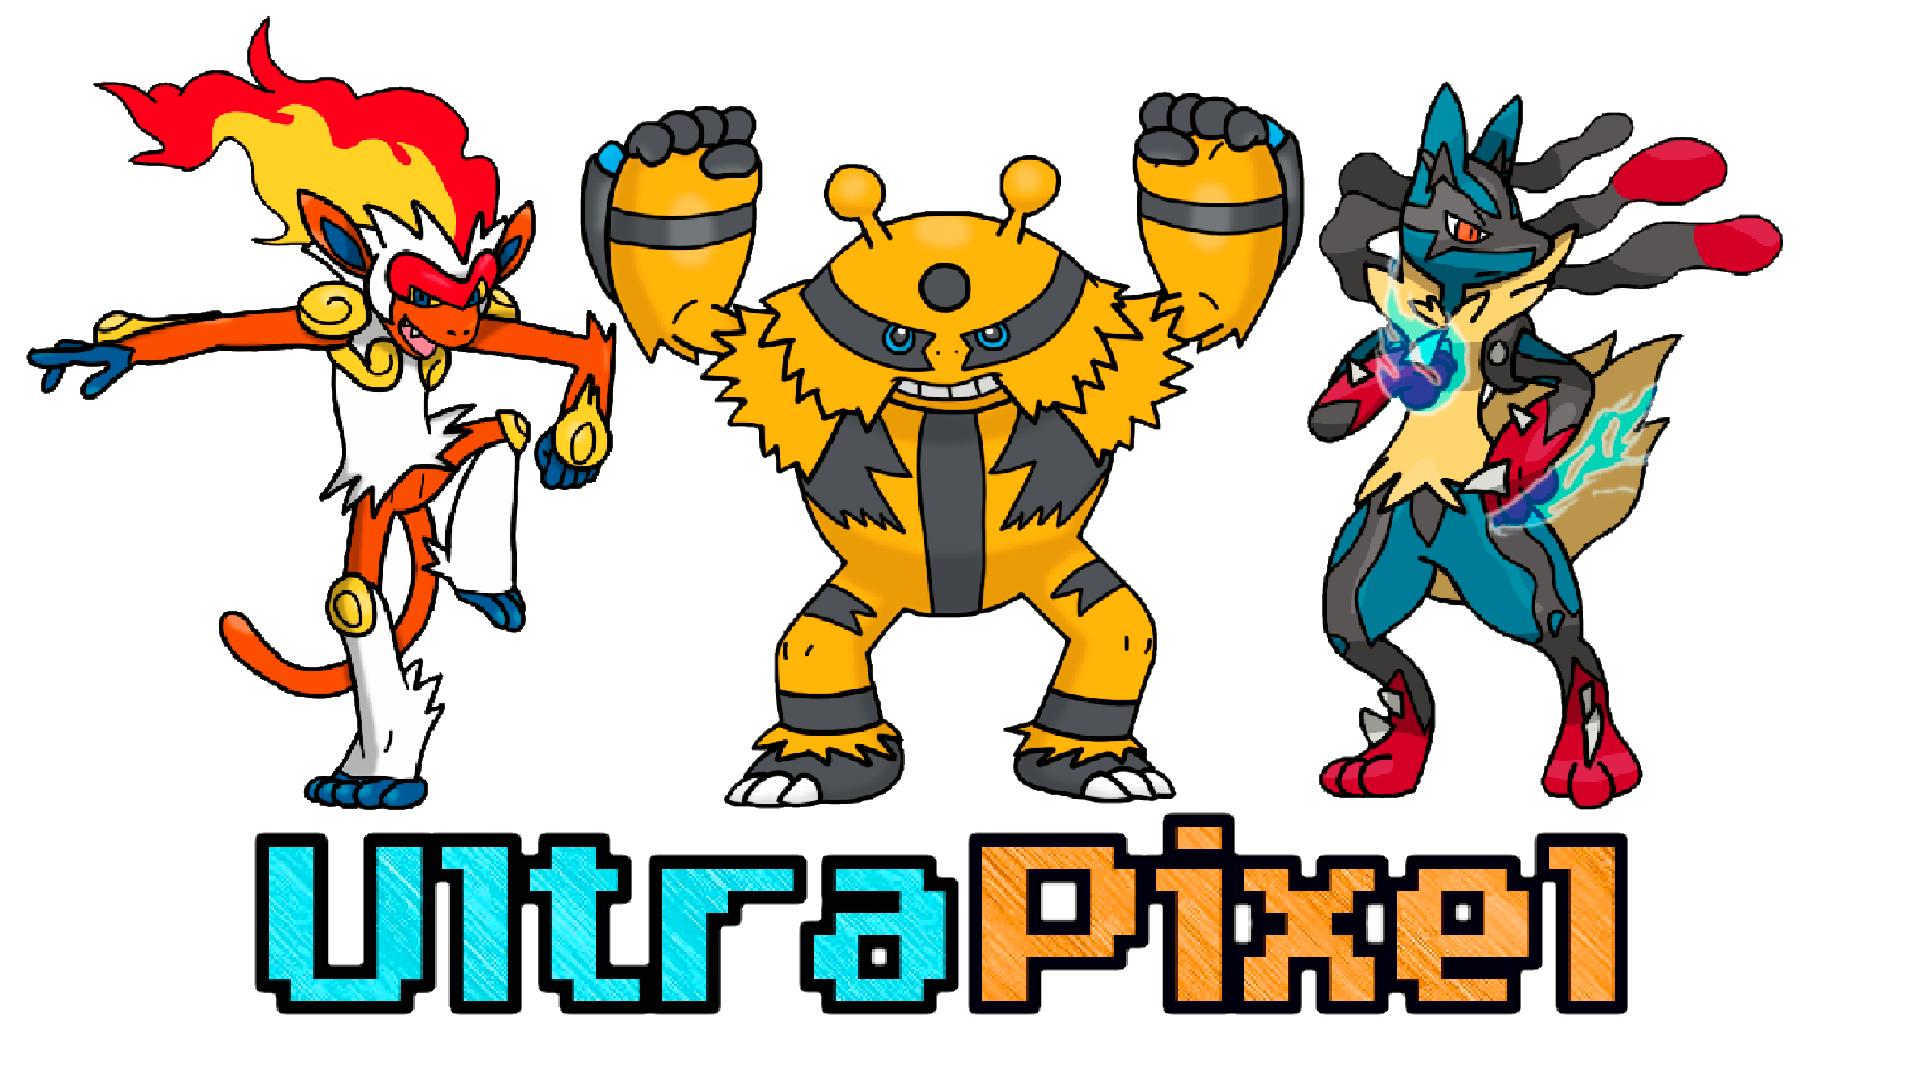 UltraPixel